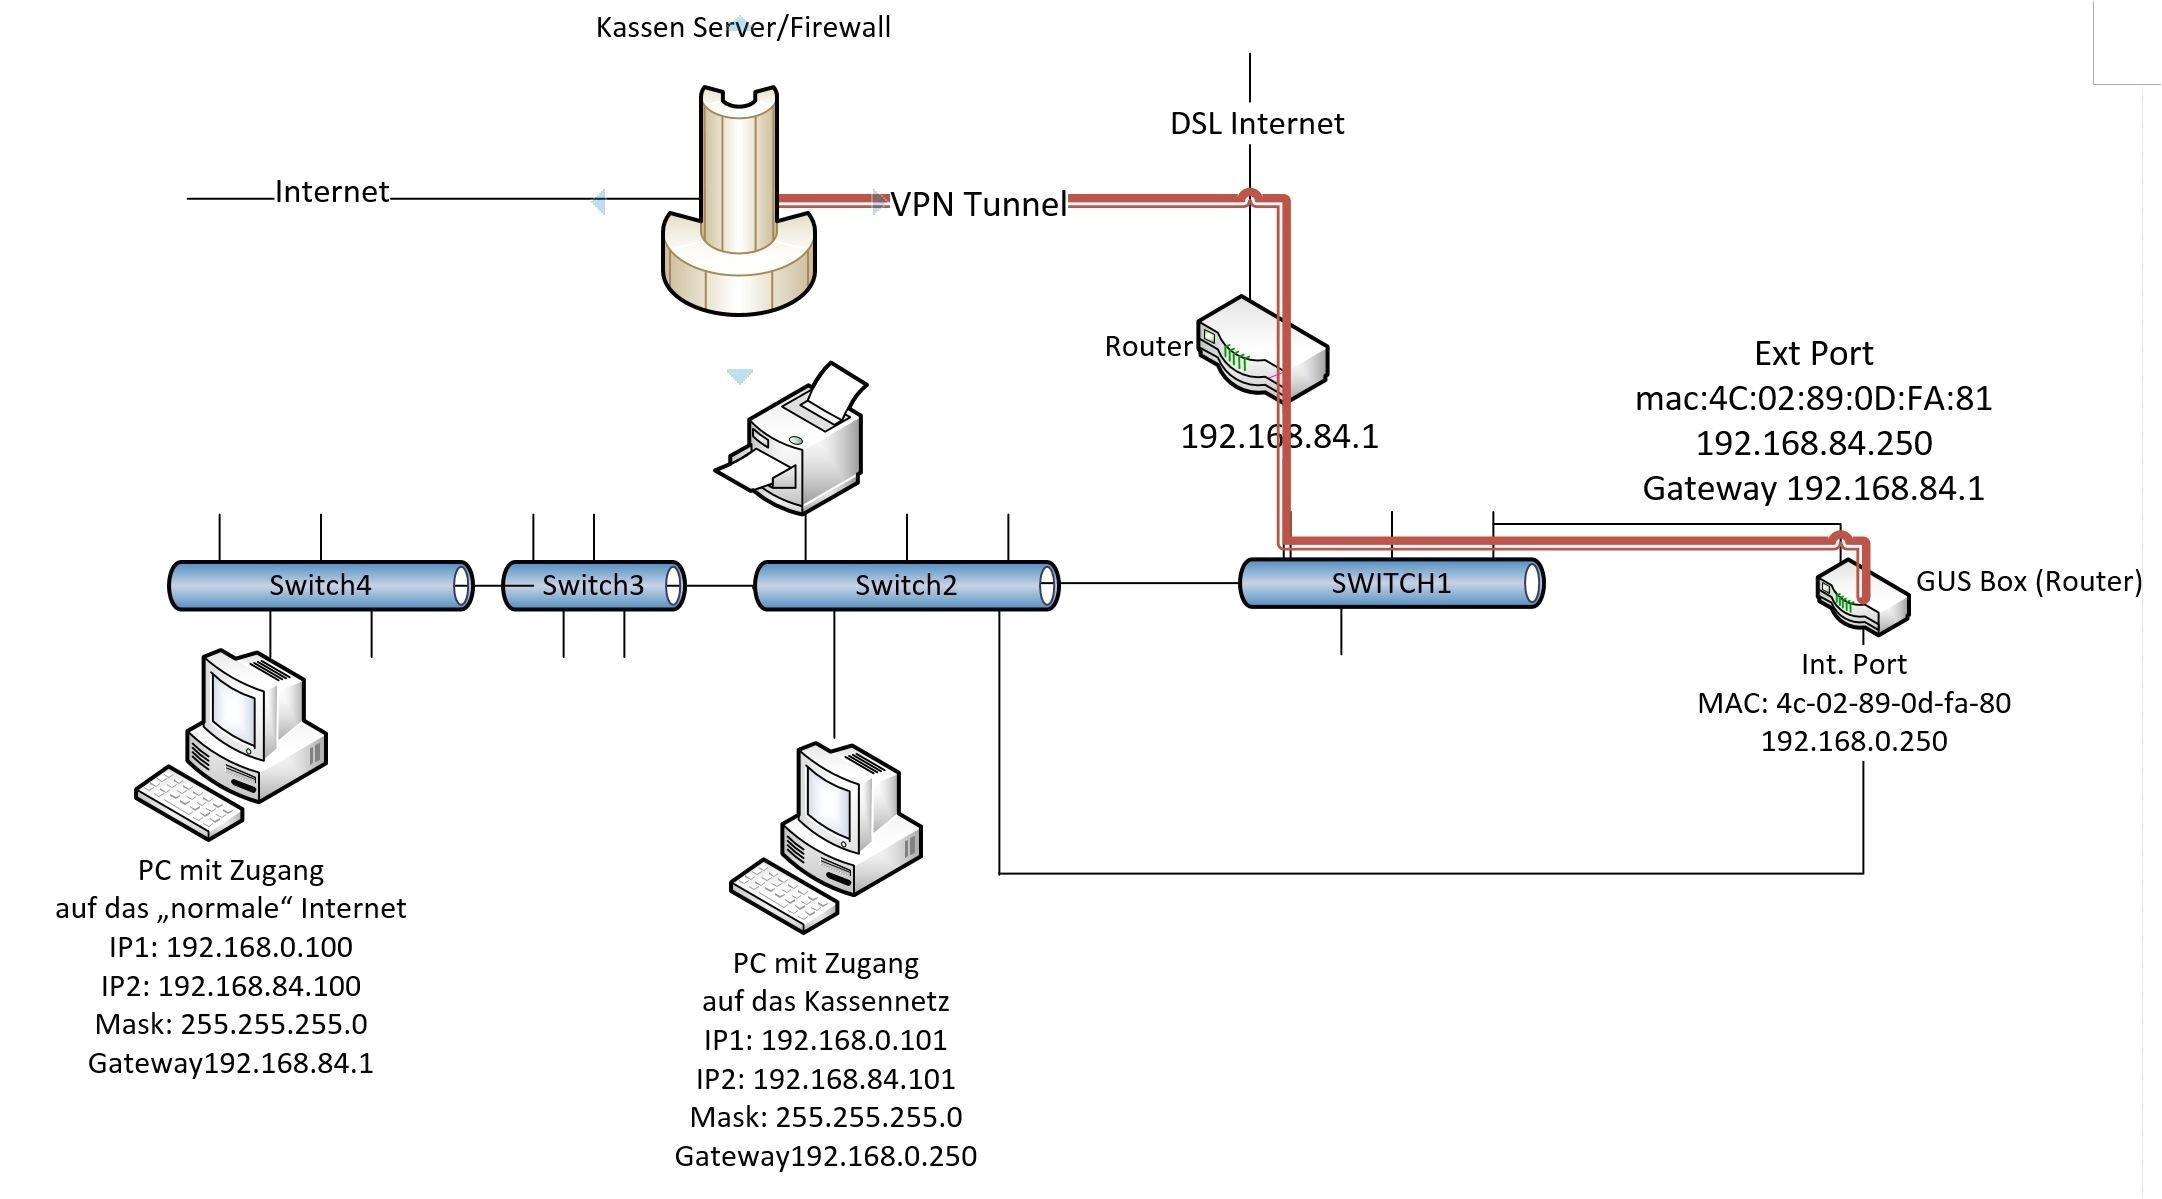 ethernet wiring diagram wall jack new internet dsl wiring diagram basic wiring diagram e280a2 jpg